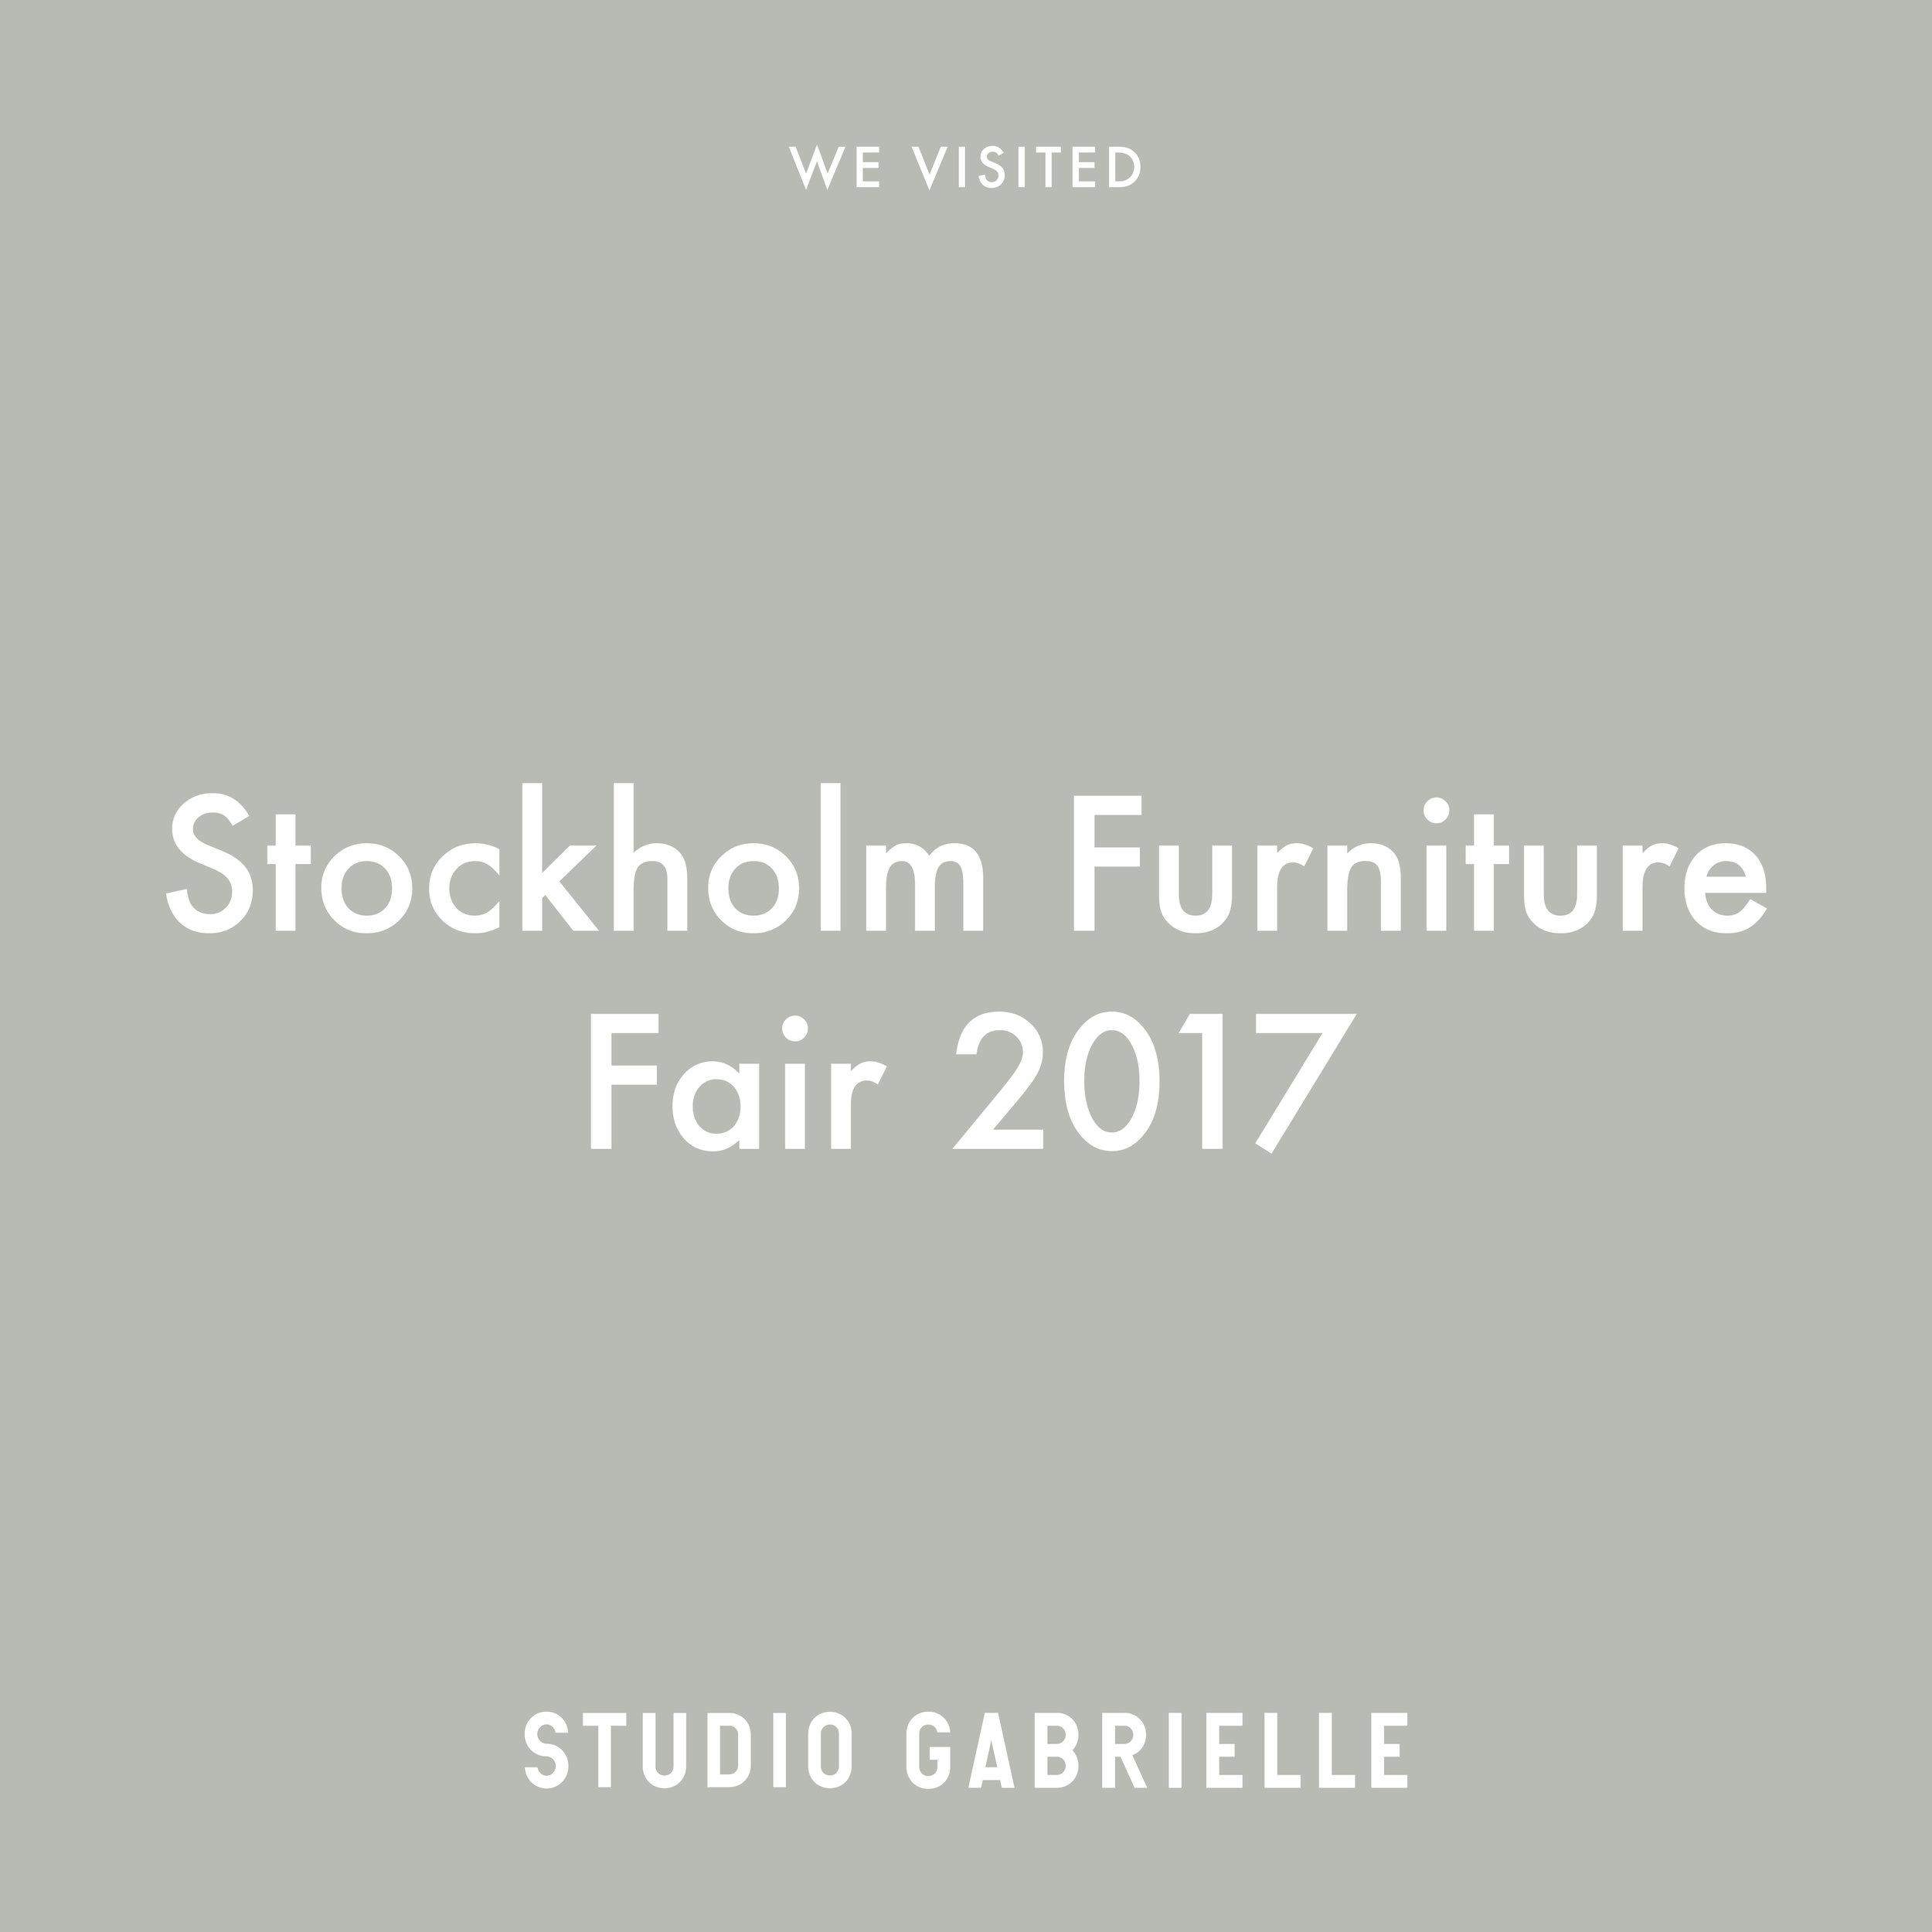 StudioGabrielle_StockholmFurnitureFair_2017